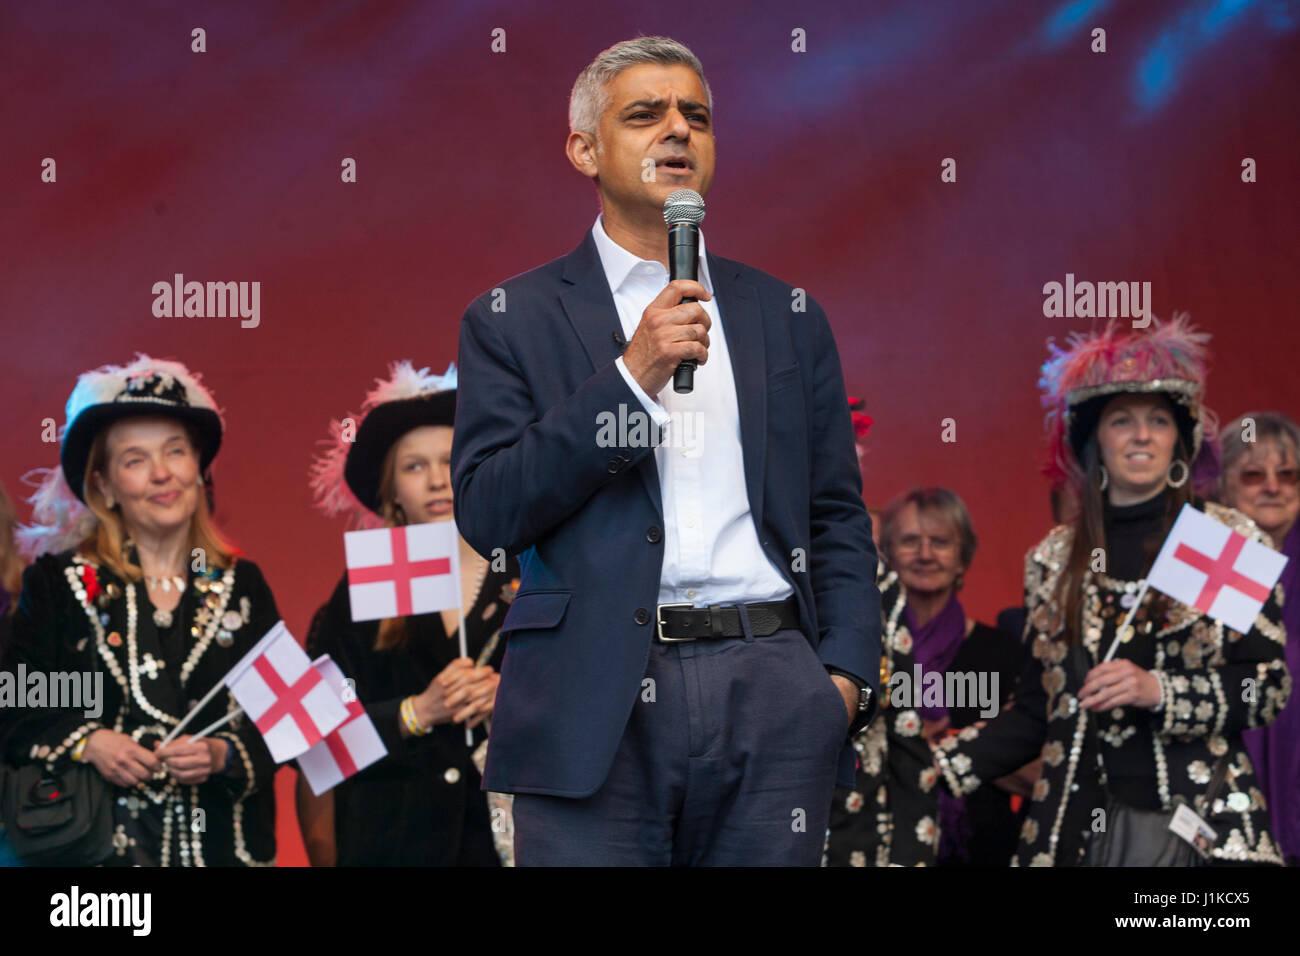 Trafalgar Square, London UK. 22 April, 2017. Feast of St. George.  London Mayor Sadiq Khan at London's annual - Stock Image